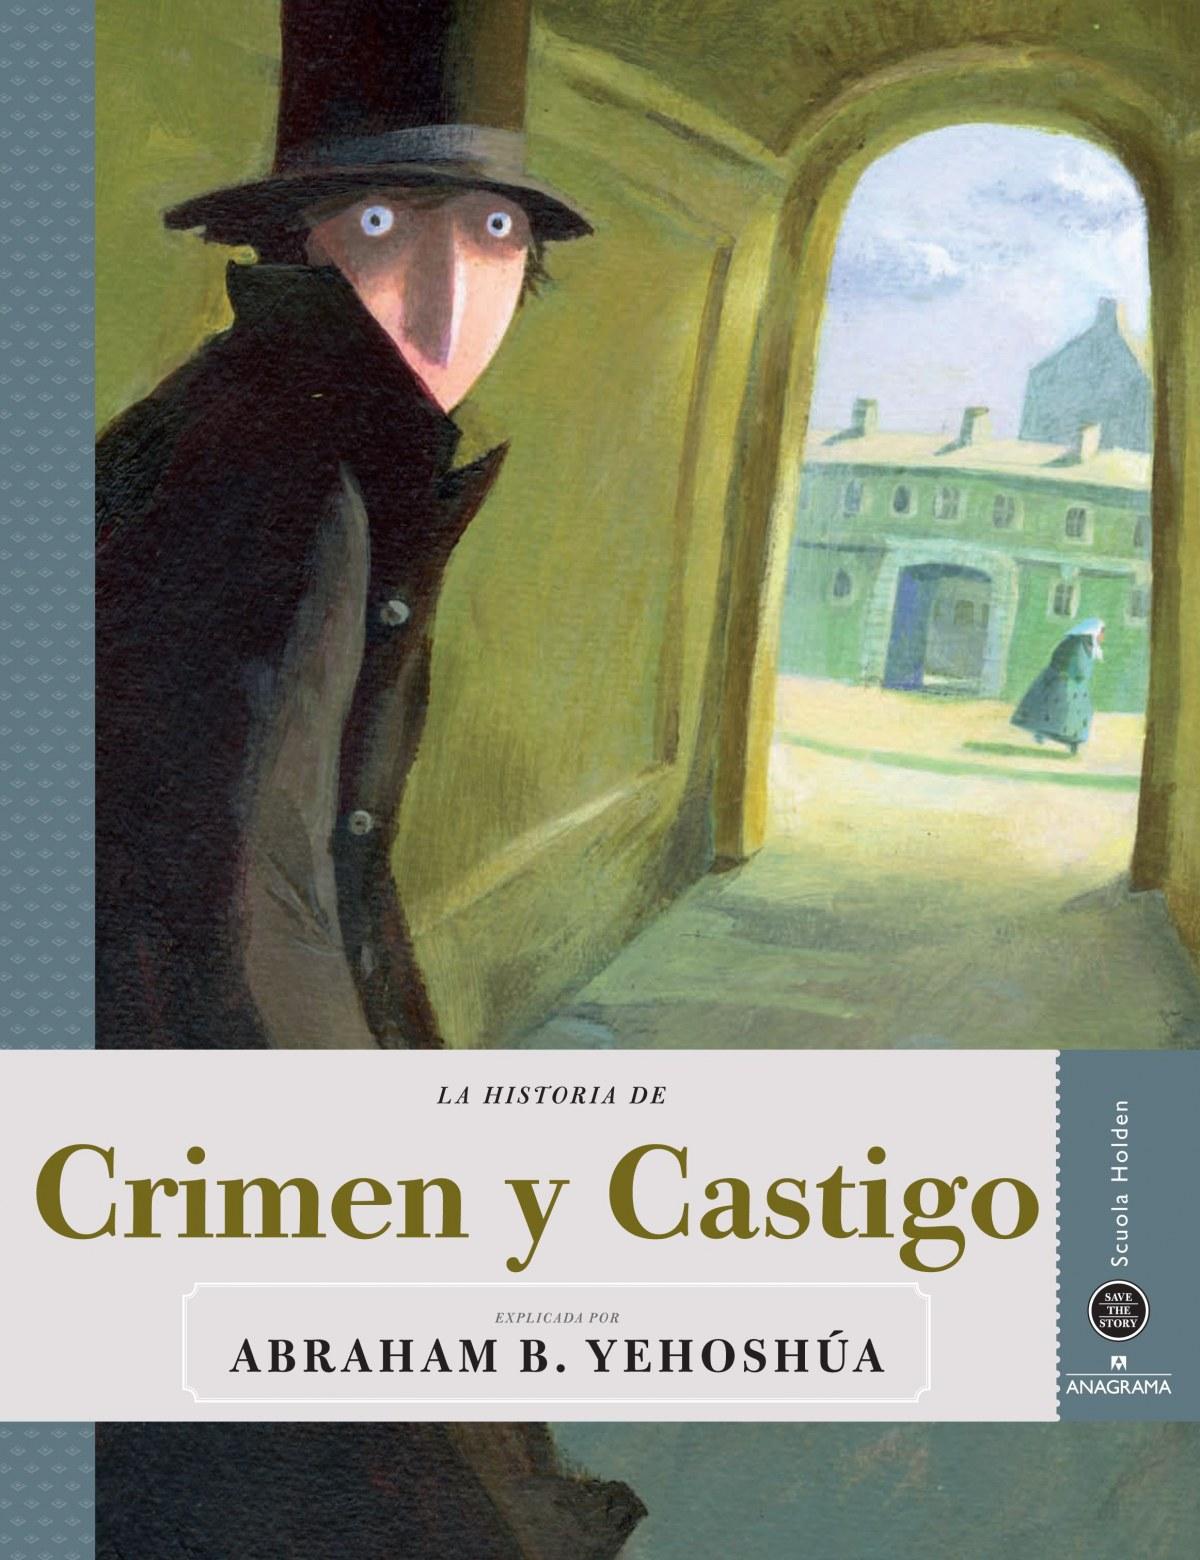 La historia de crimen y castigo 9788433961235